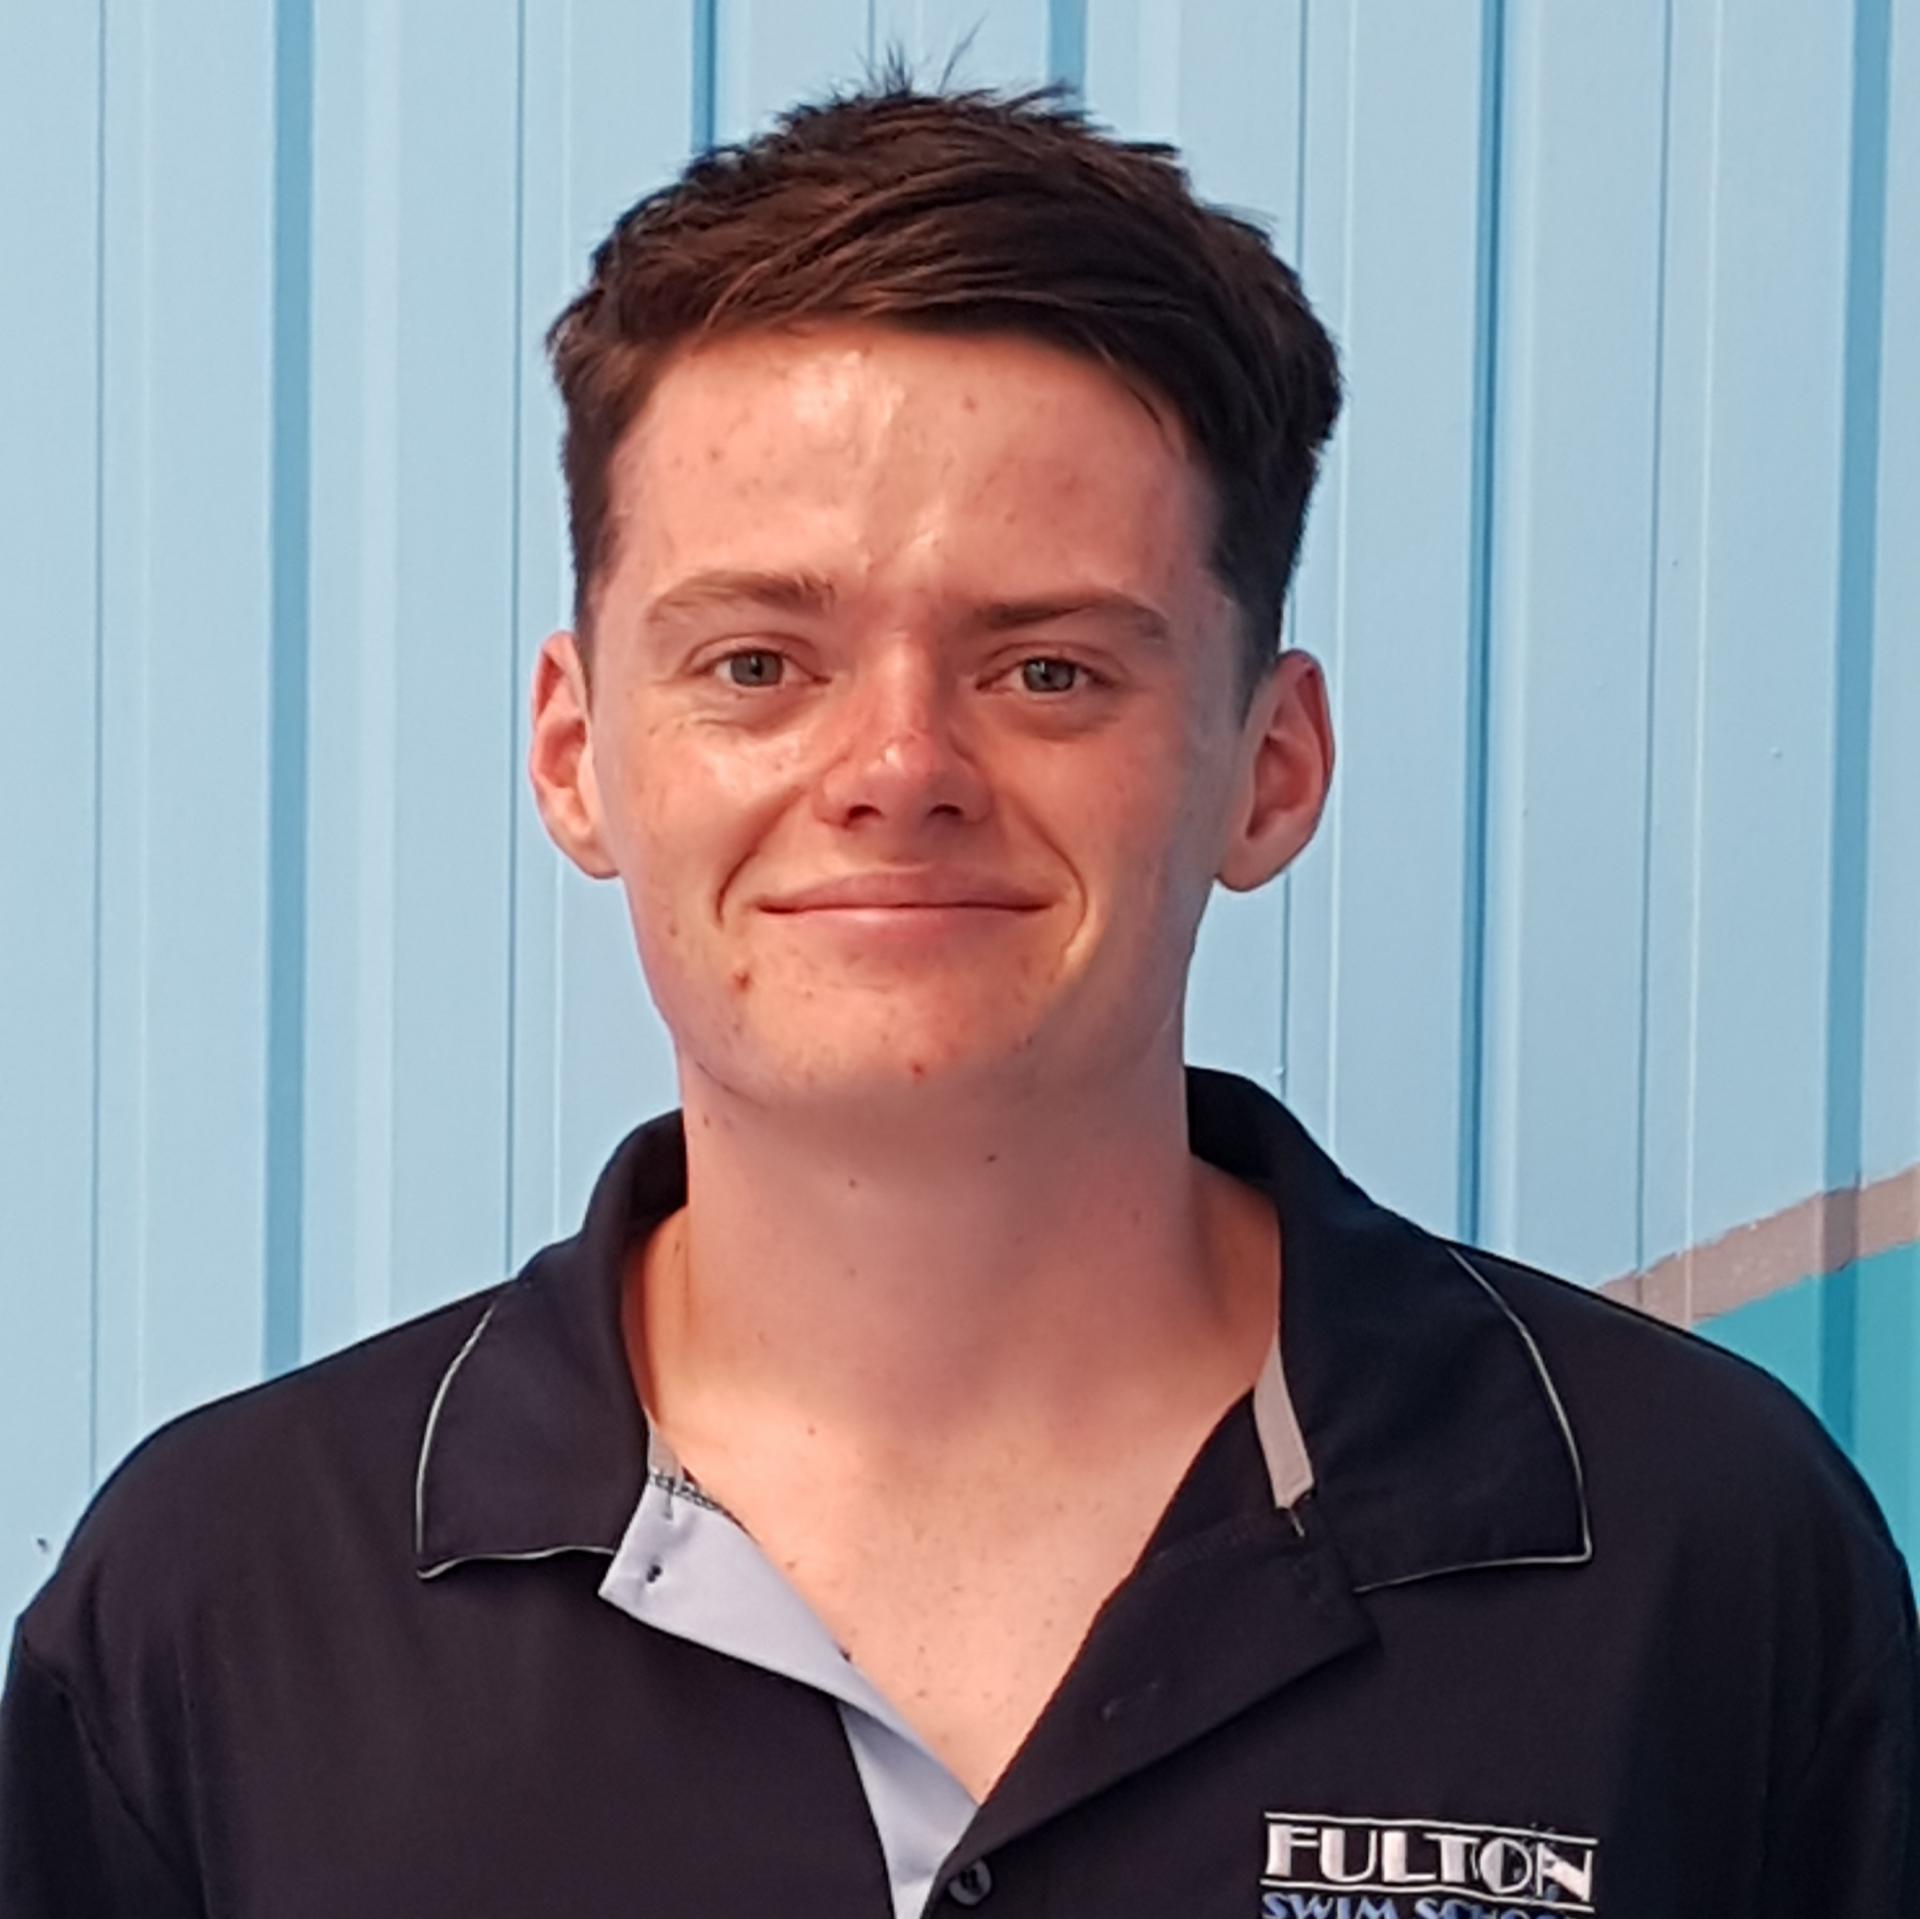 Angus - Fulton Swim School Teacher